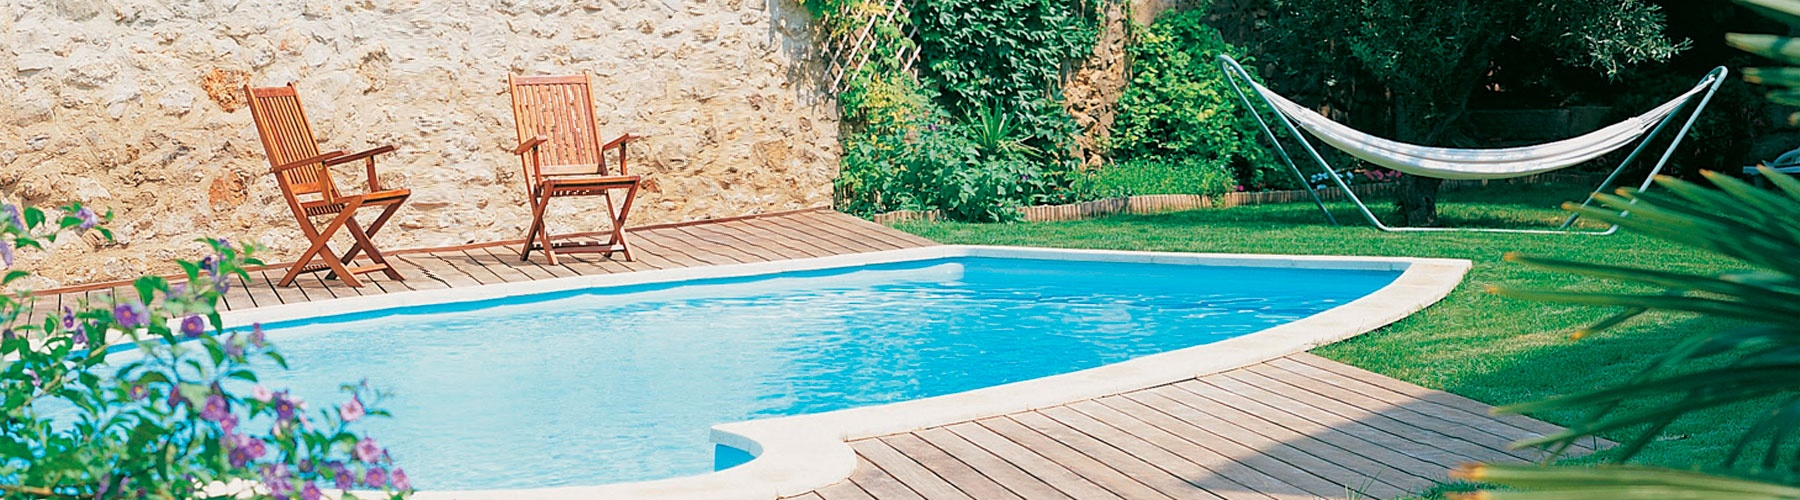 Como hacer tu propia piscina piscinas con palets with for Como hacer tu propia alberca